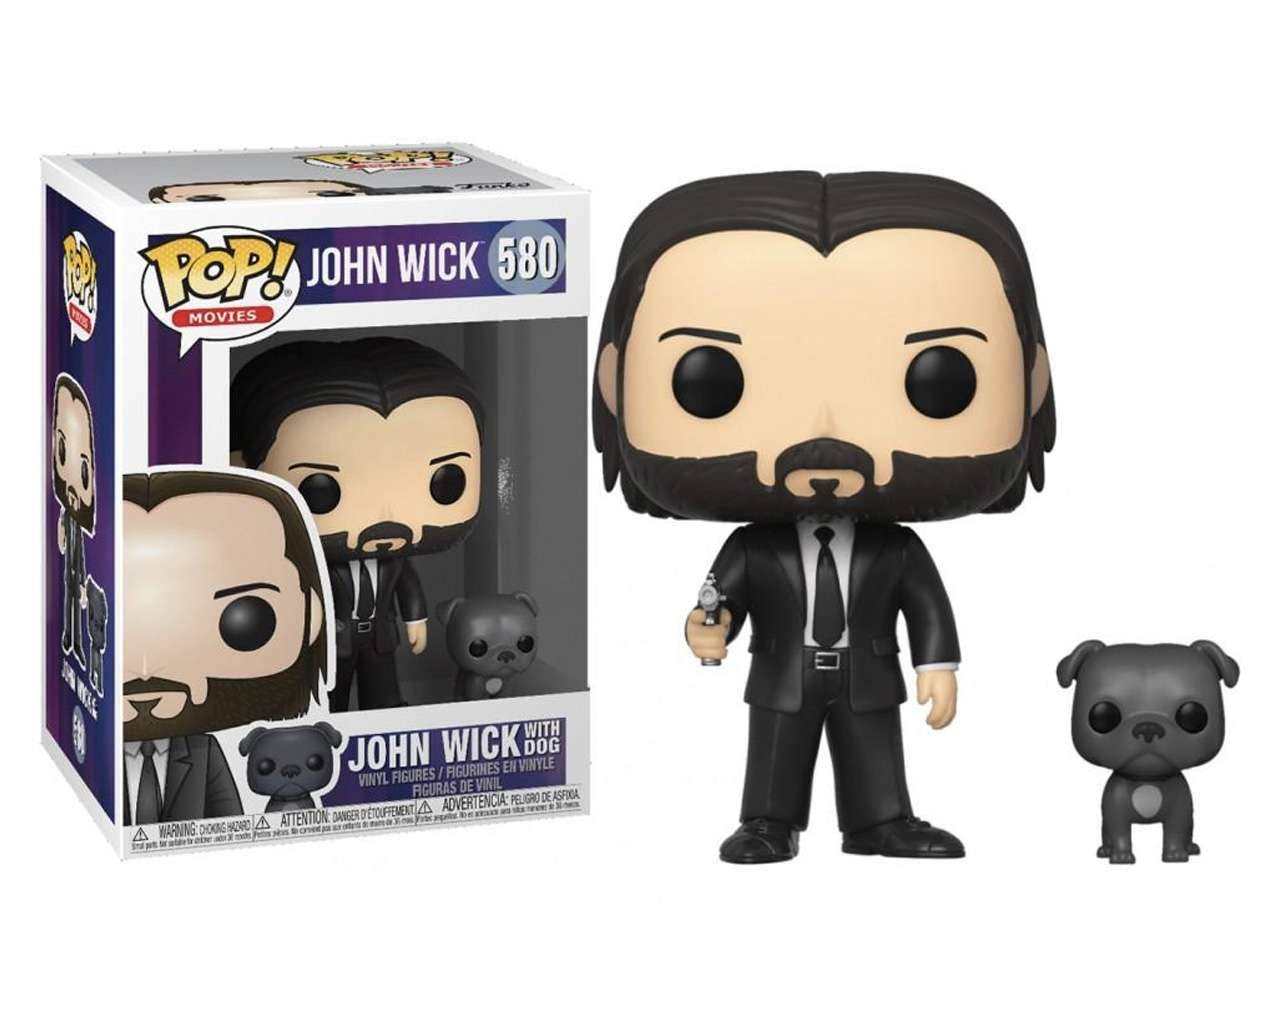 John Wick with Dog Pop! Vinyl